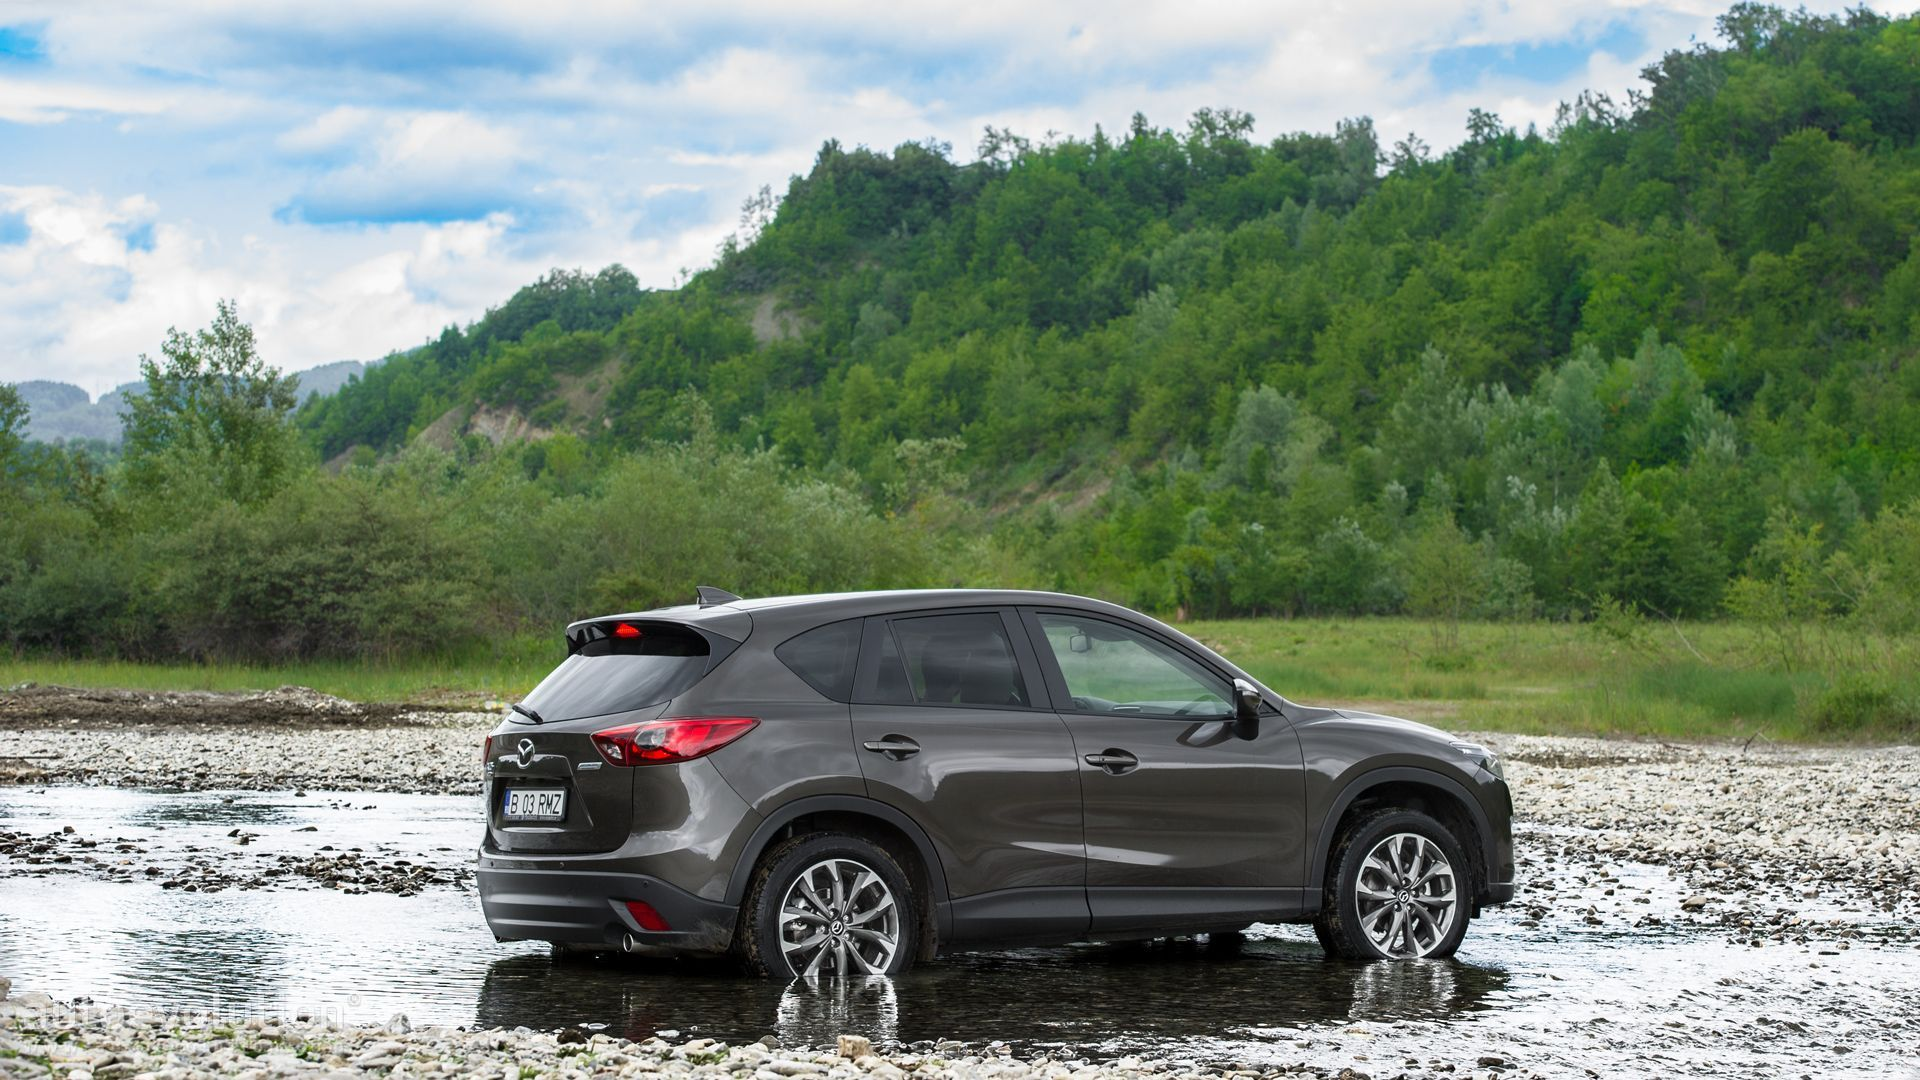 S Mazda Cx 5 Mozhe Da Prekosite Vsyakakvi Tereni Mazda Mazda